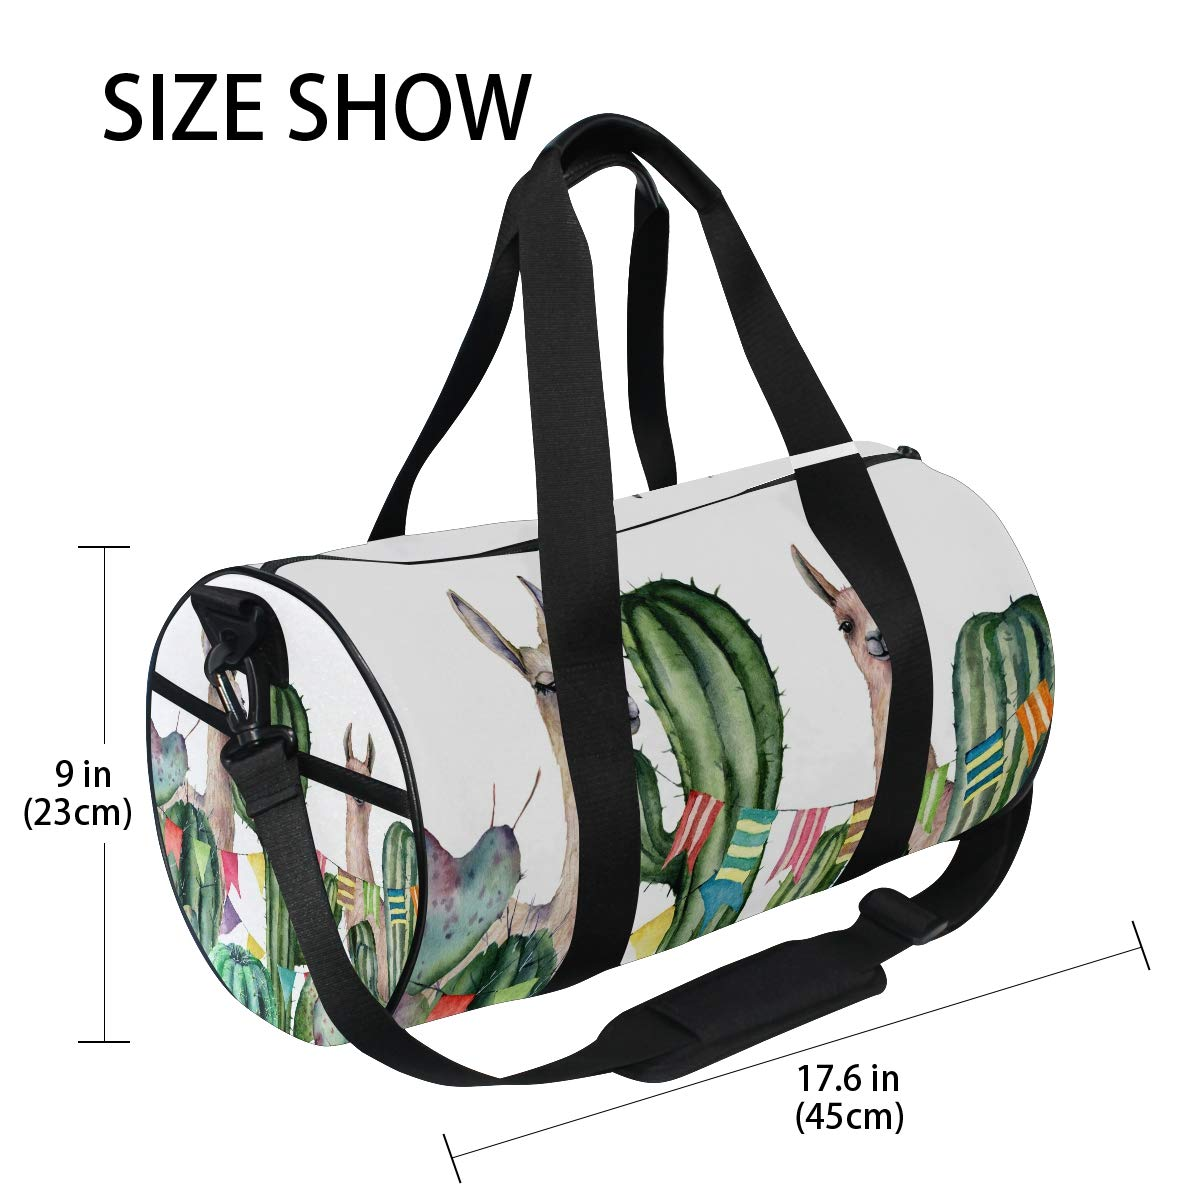 WIHVE Gym Duffel Bag Watercolor Llamas Cactus Bushes Sports Lightweight Canvas Travel Luggage Bag